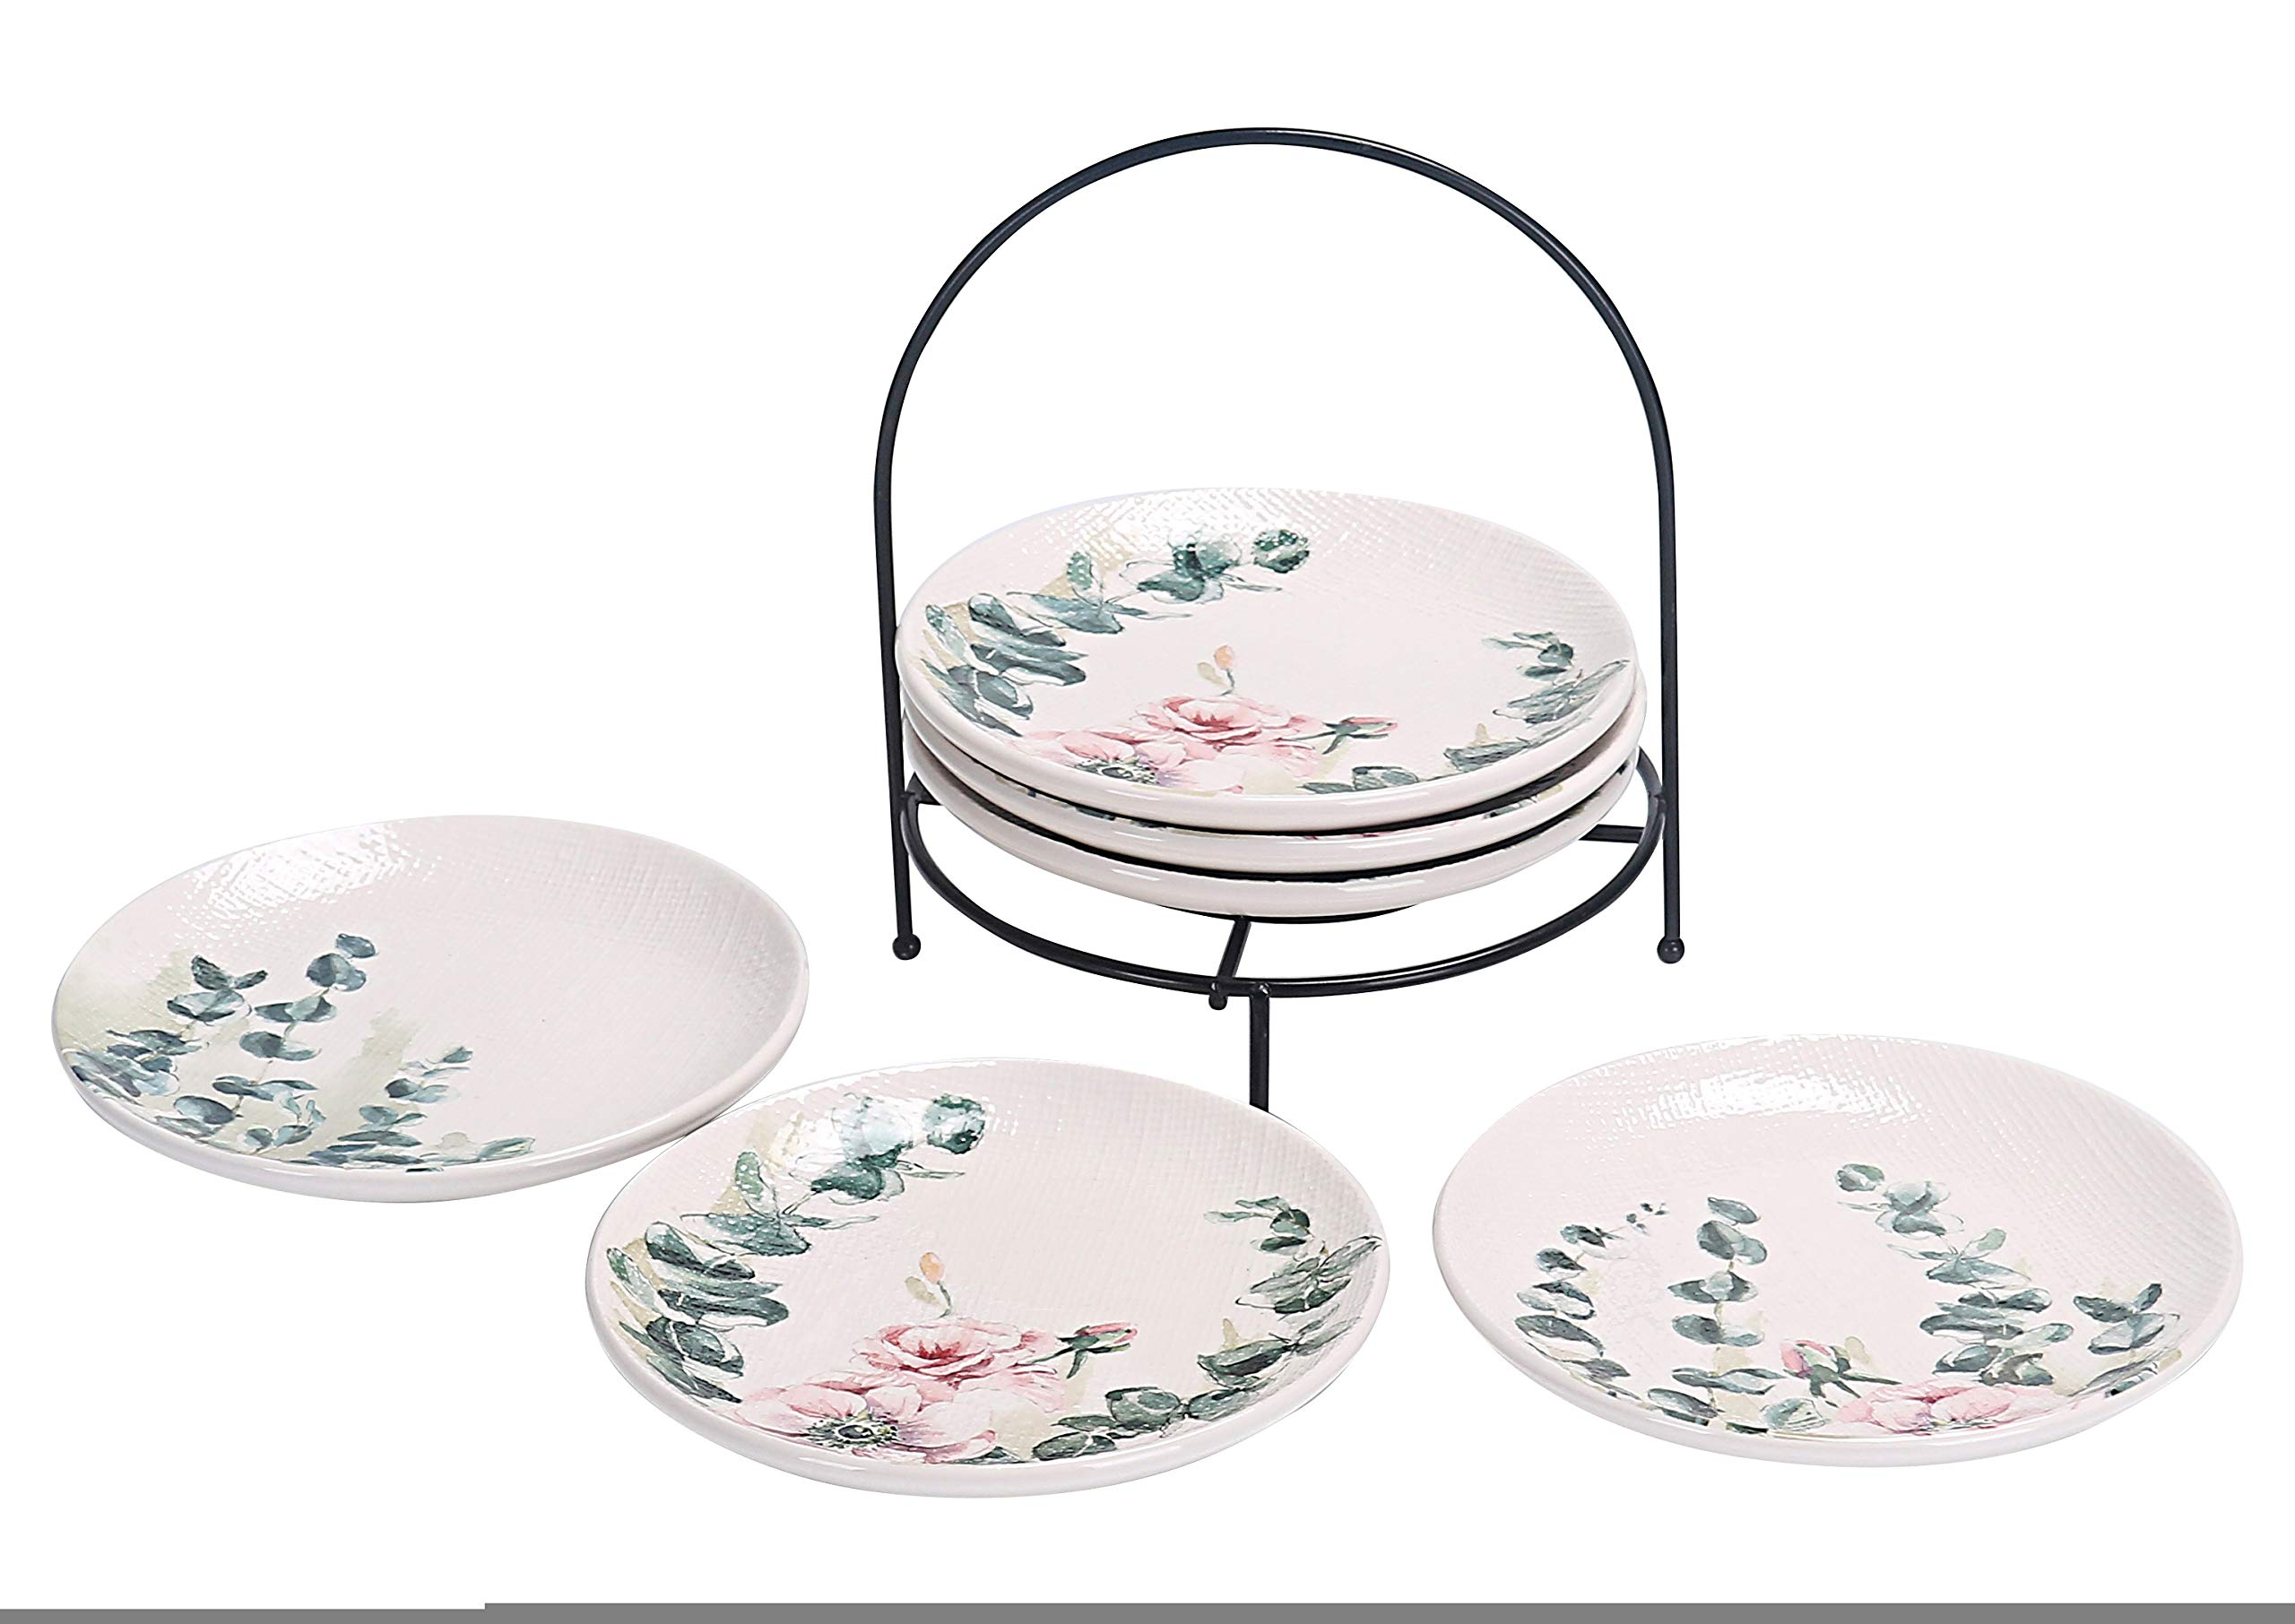 Bico Spring Eucalyptus 6 inch Ceramic Appetizer Plate with Rack, Set of 7, for Salad, Appetizer, Snacks, Plates Microwave & Dishwasher Safe